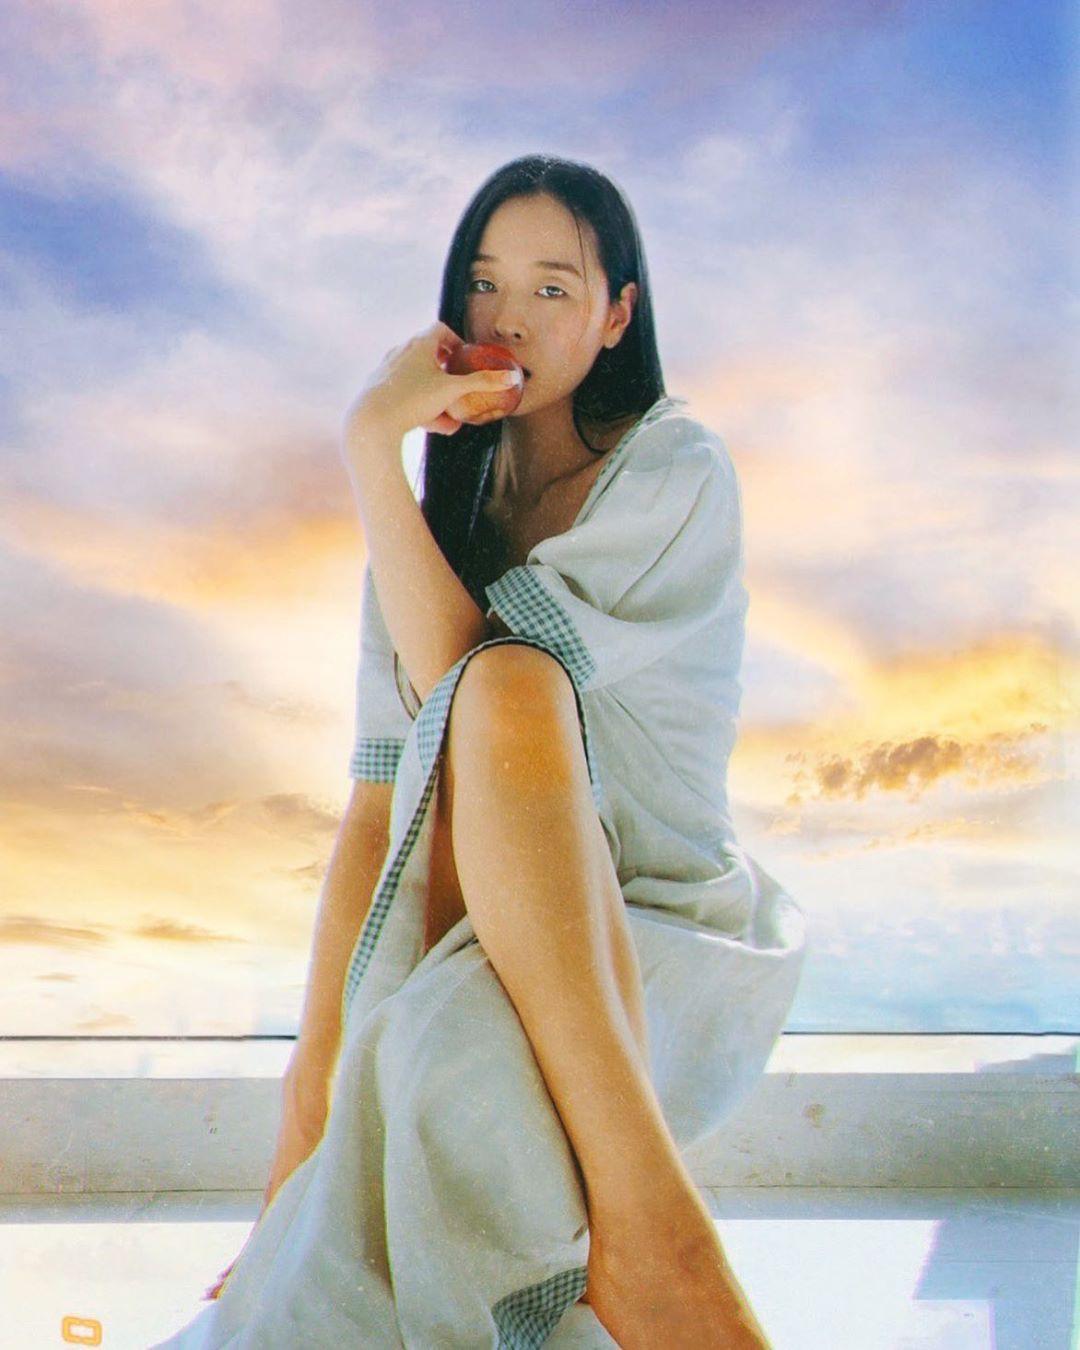 Sang A Yonini fashion photography, hot legs, Sexy Models